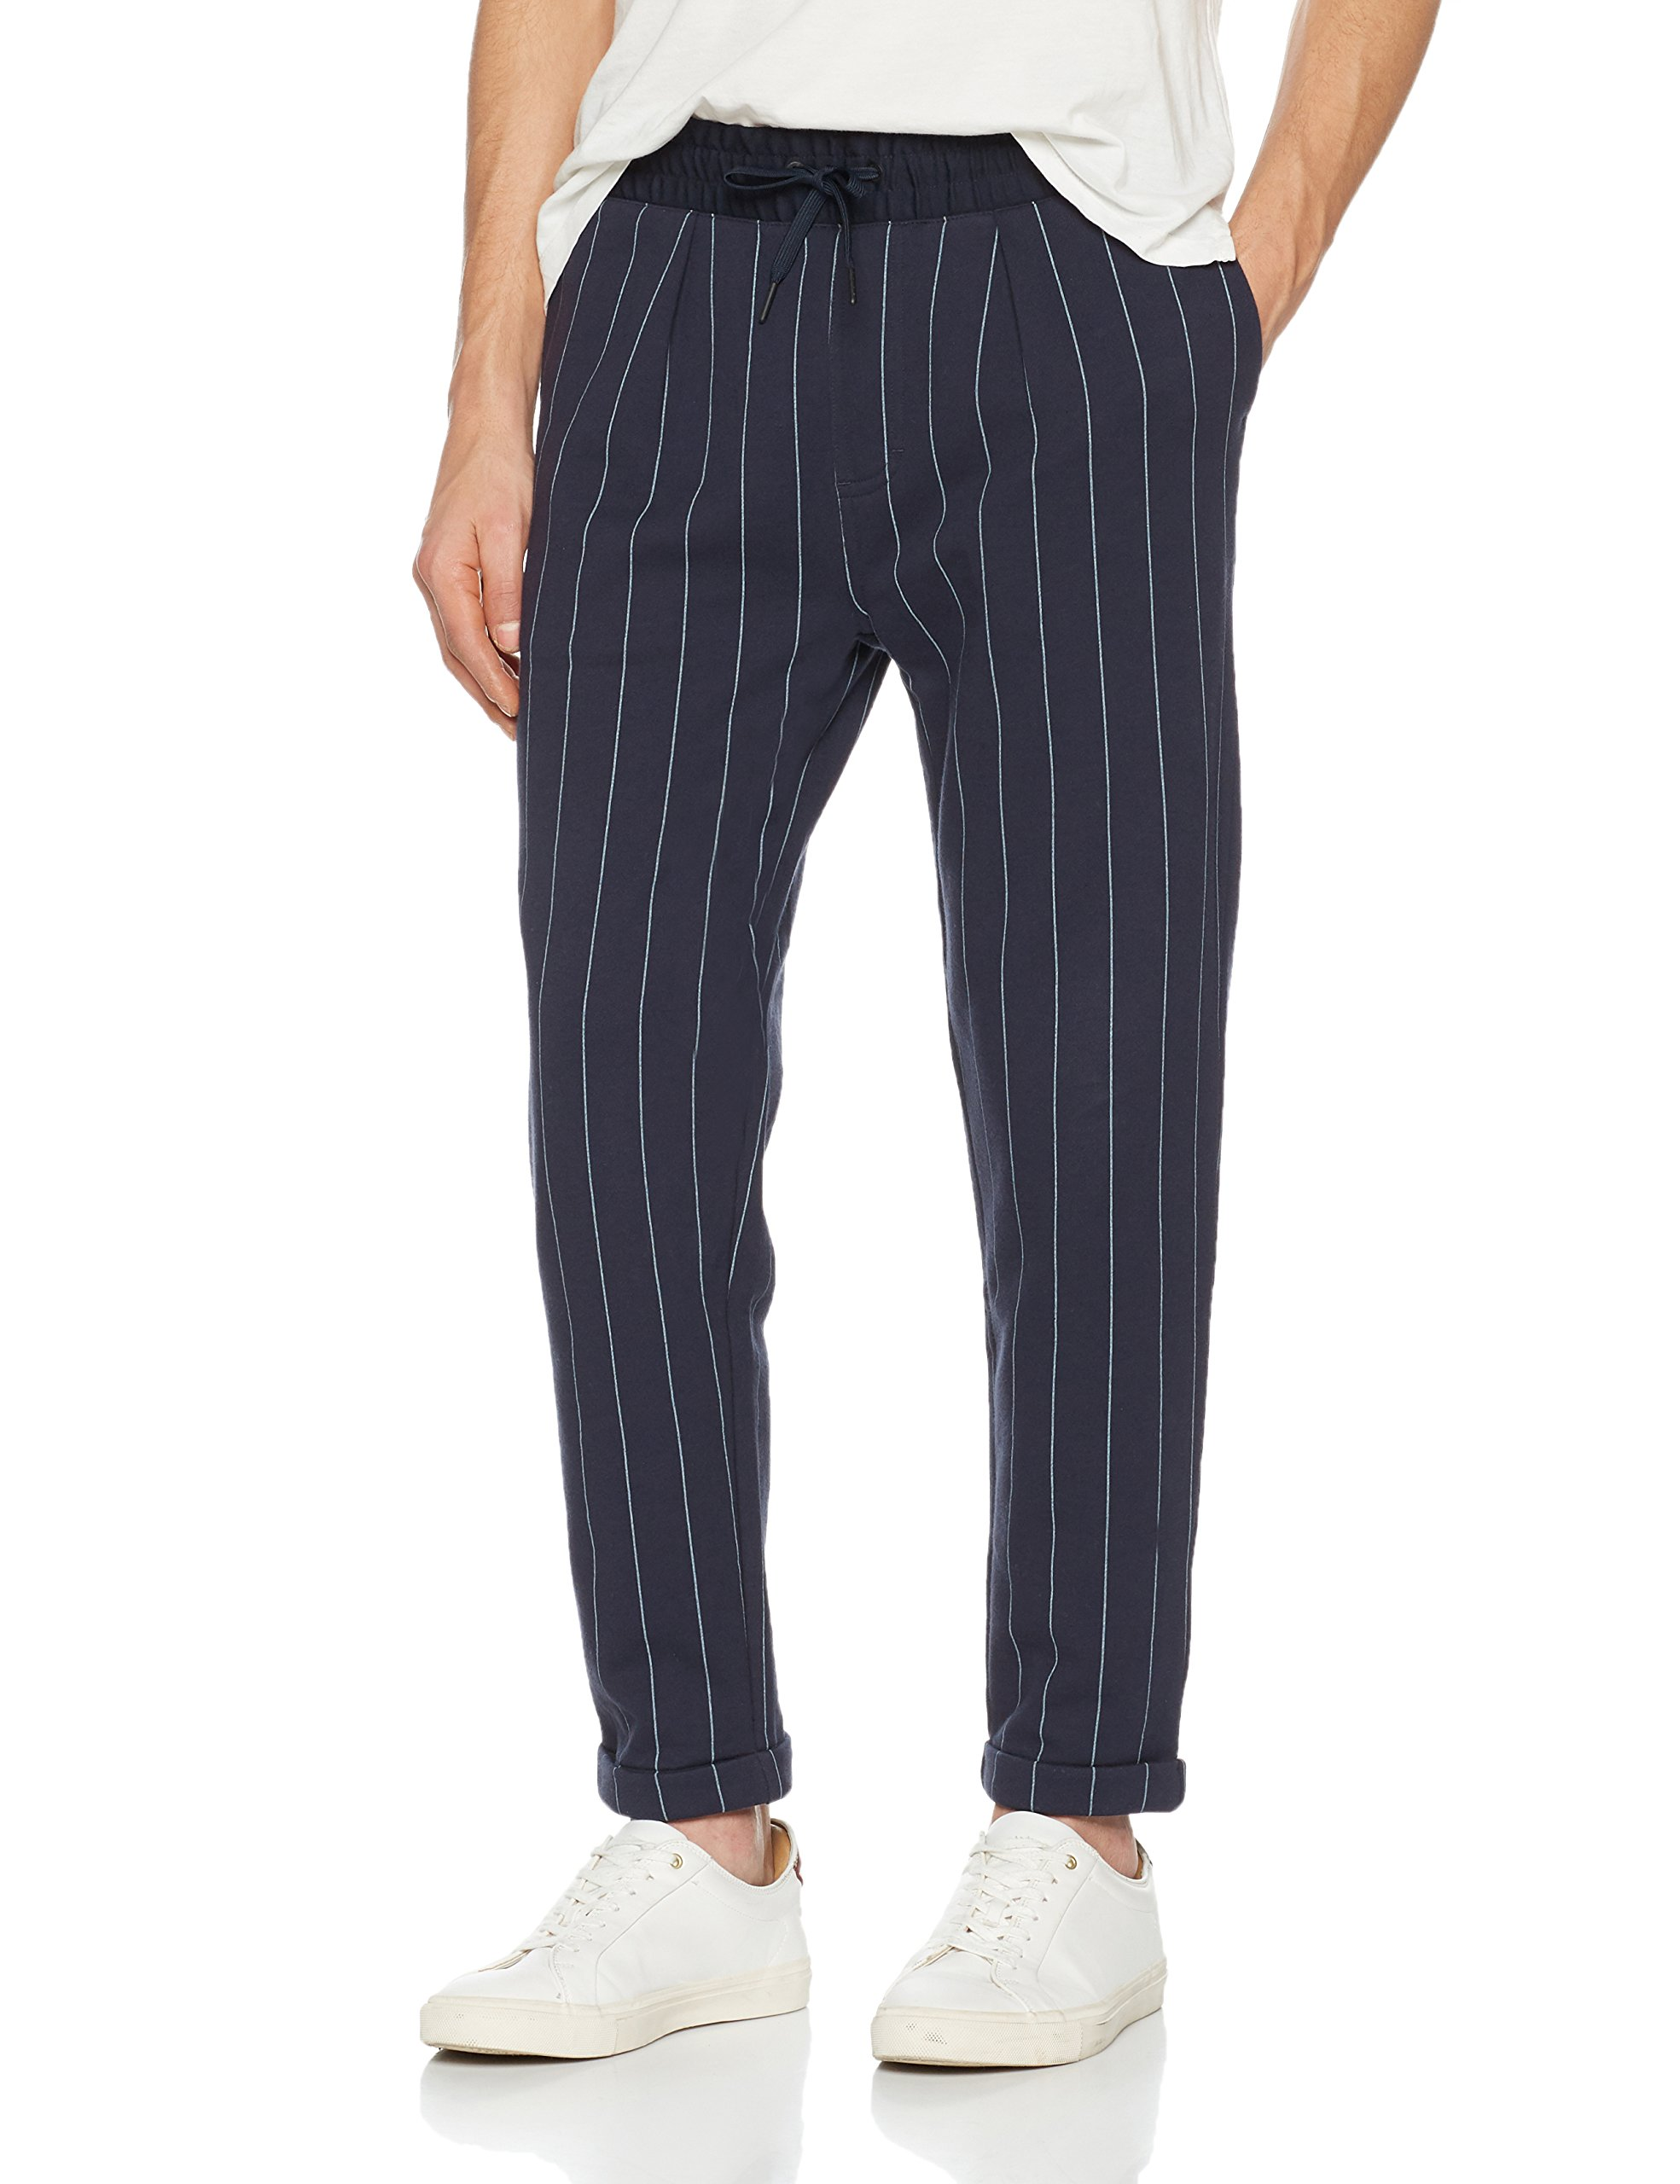 Fit 40250taille Jeans SportBleunight Tapered Hespero Joggingpant Calvin Klein Sky Pantalon De FabricantLargeHomme 3 uKTlc1J3F